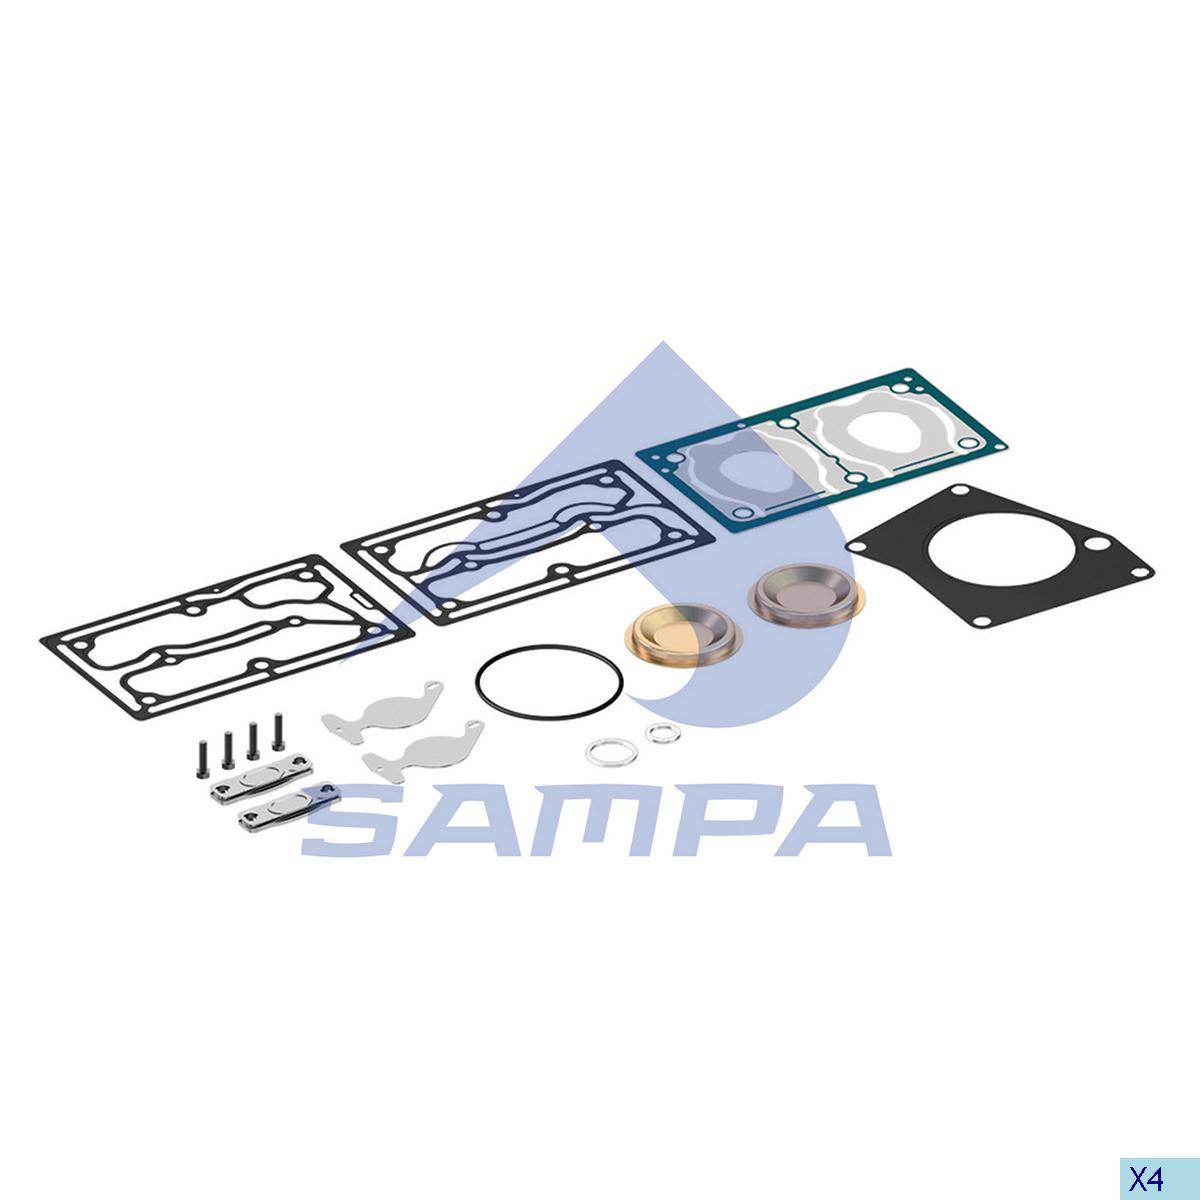 Repair Kit, Compressor, Mercedes, Compressed Air System